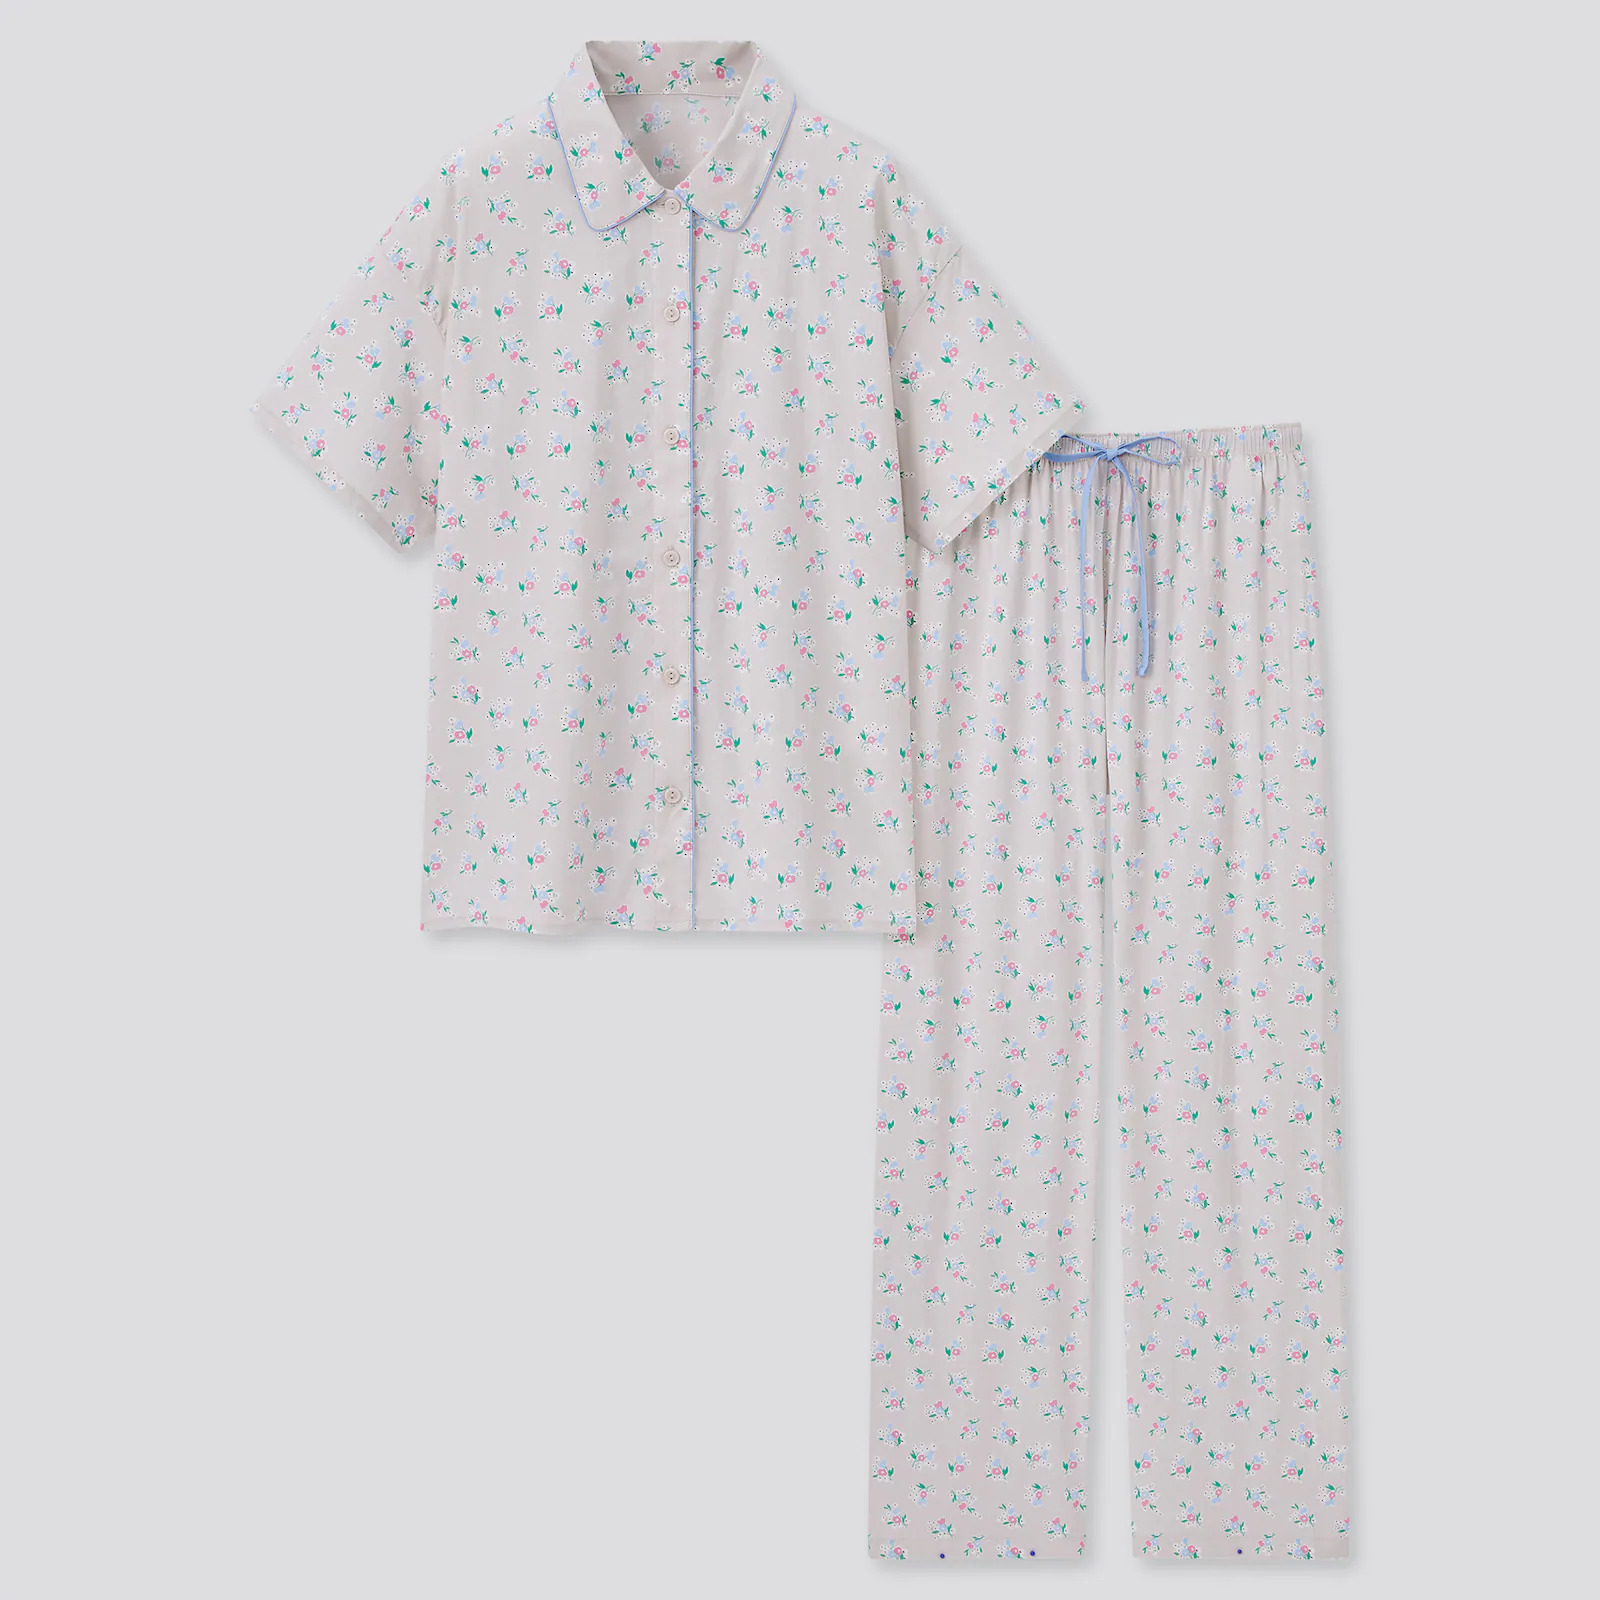 #PopbelaOOTD: Rekomendasi Baju Tidur Modis untuk Pajama Party